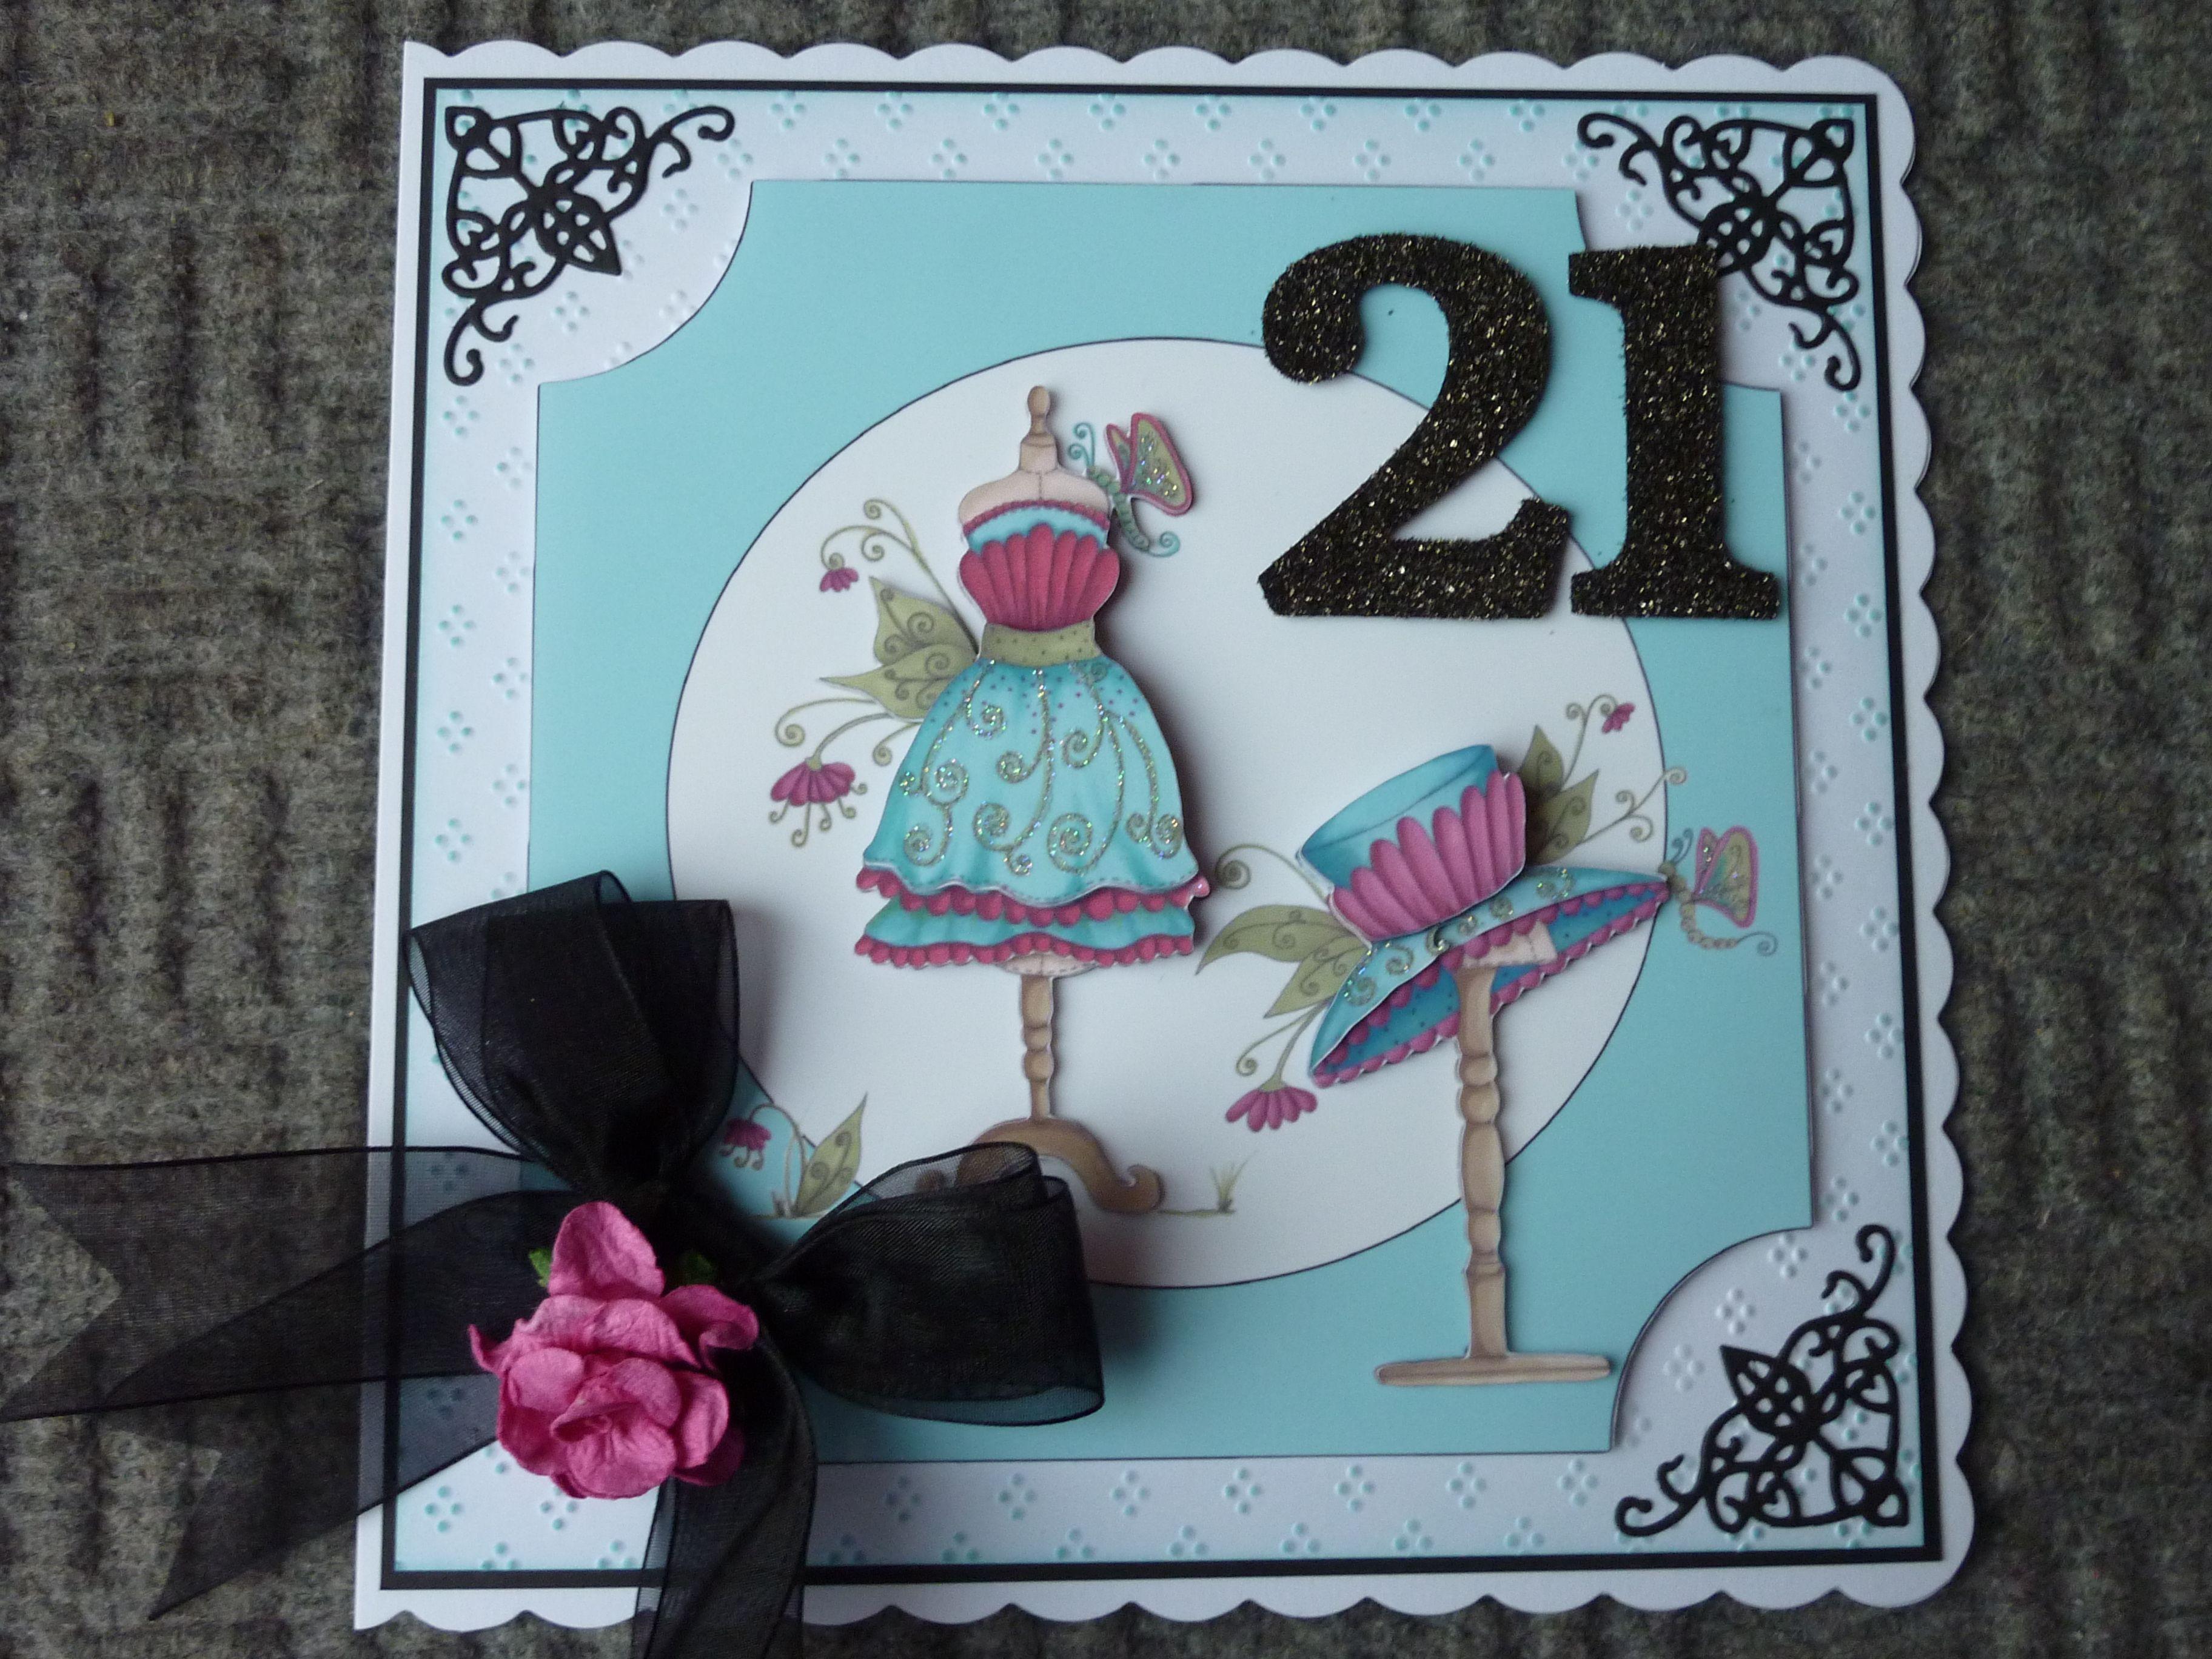 21st Birthday card using Fabulous Fashion image